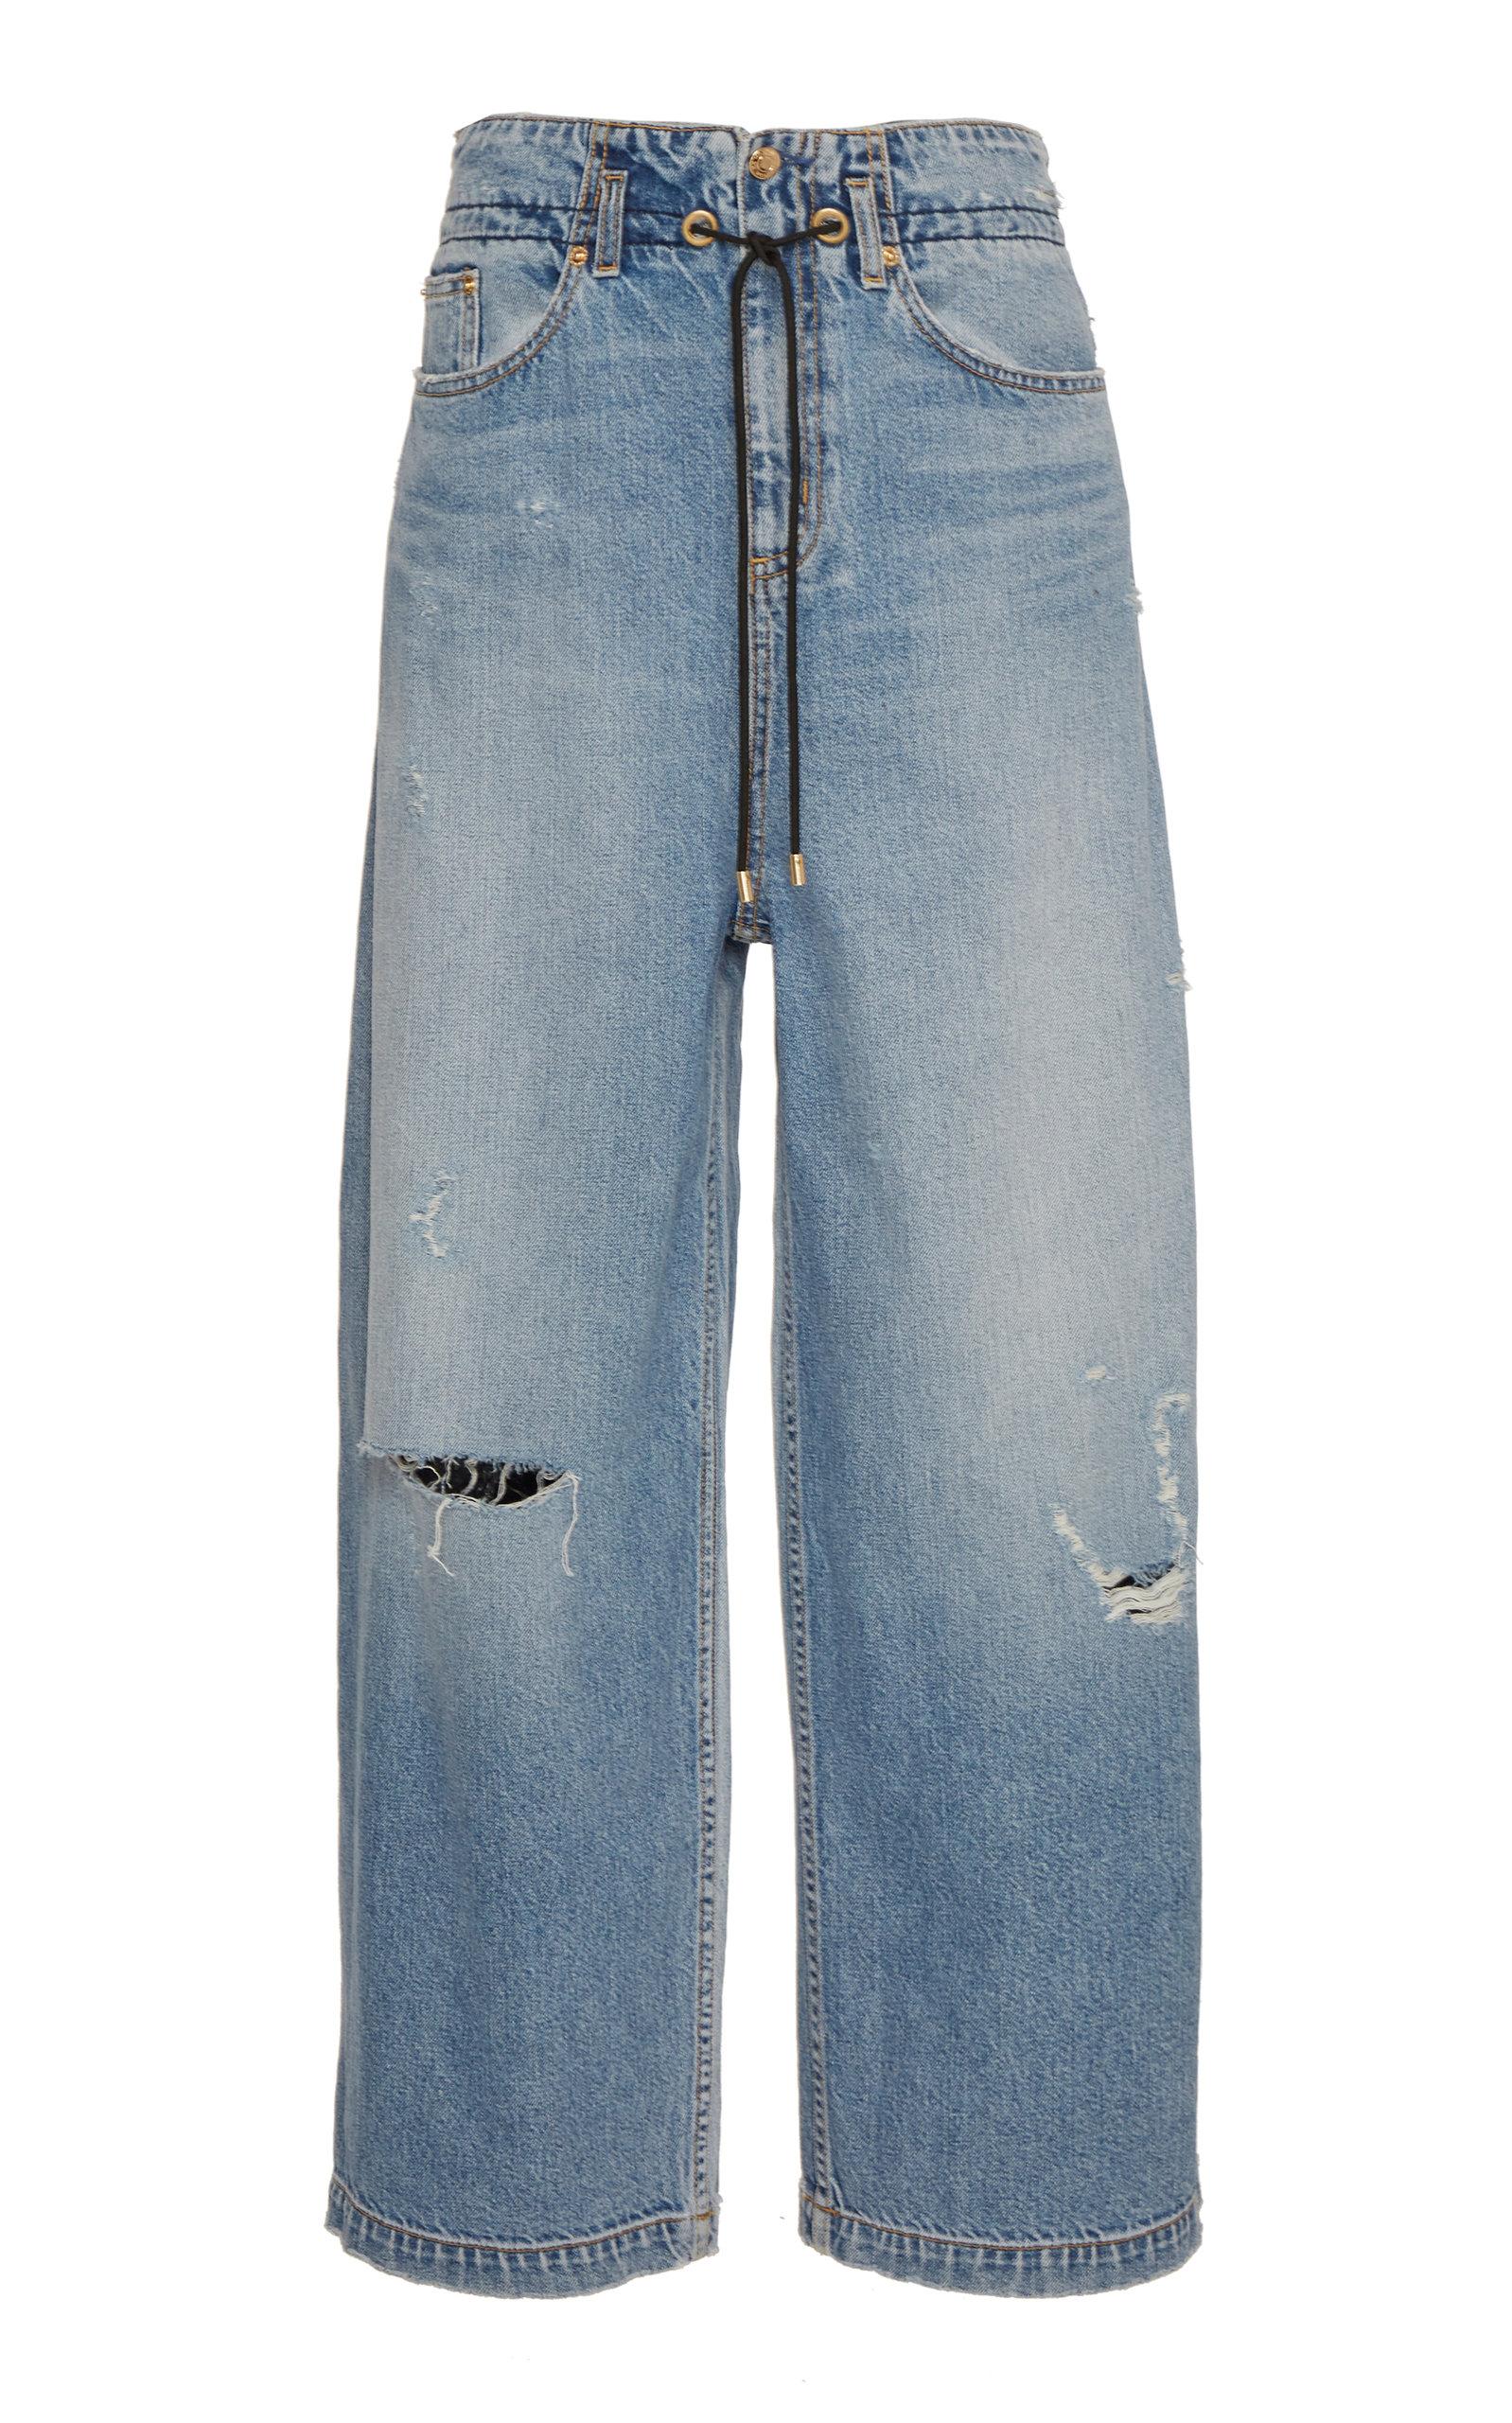 P.e Nation Jeans The 1998 Wide Leg Jean